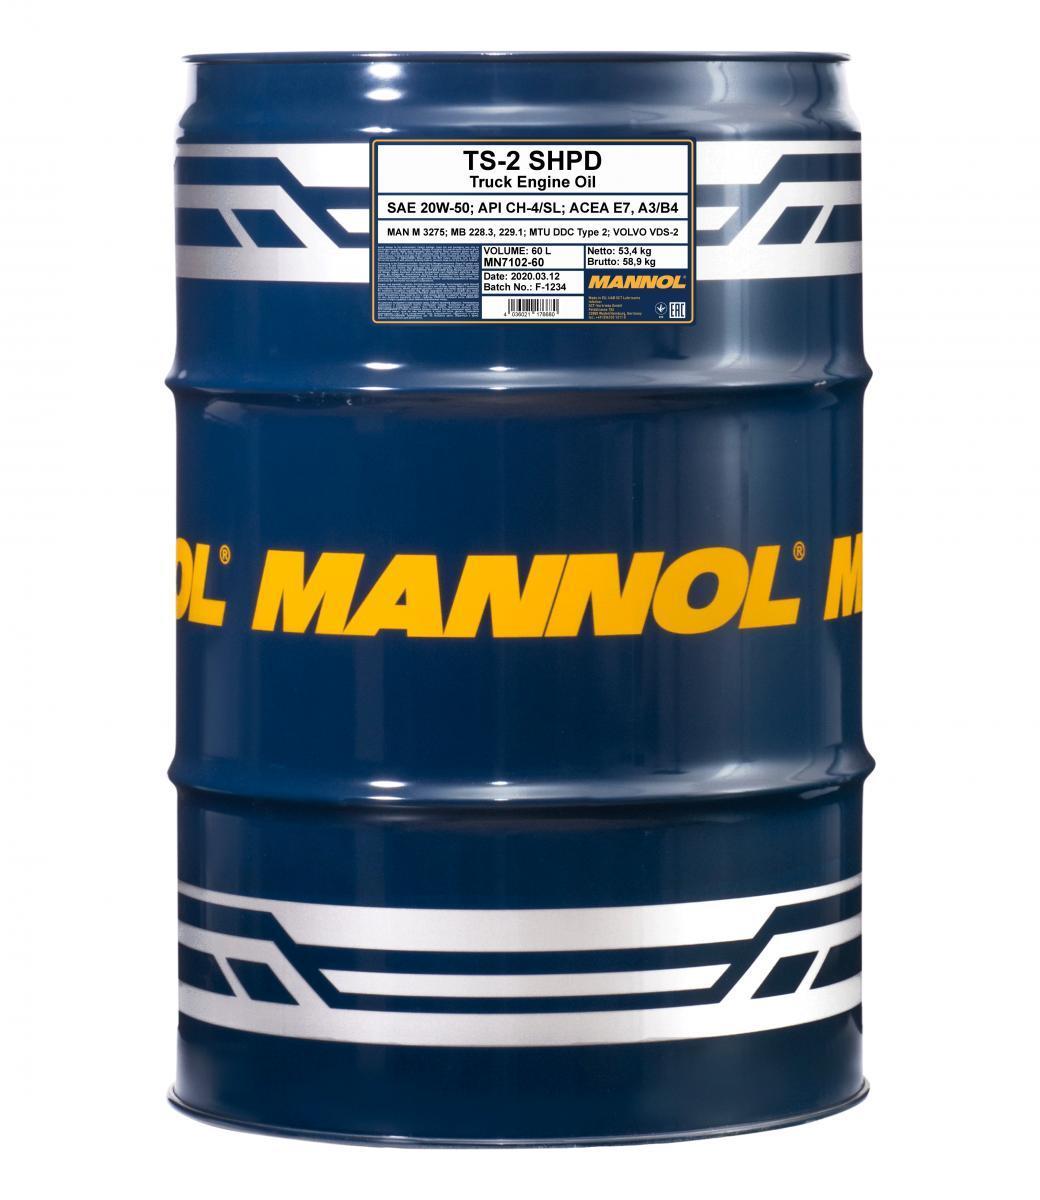 MANNOL TS-2, SHPD MN7102-60 Motoröl